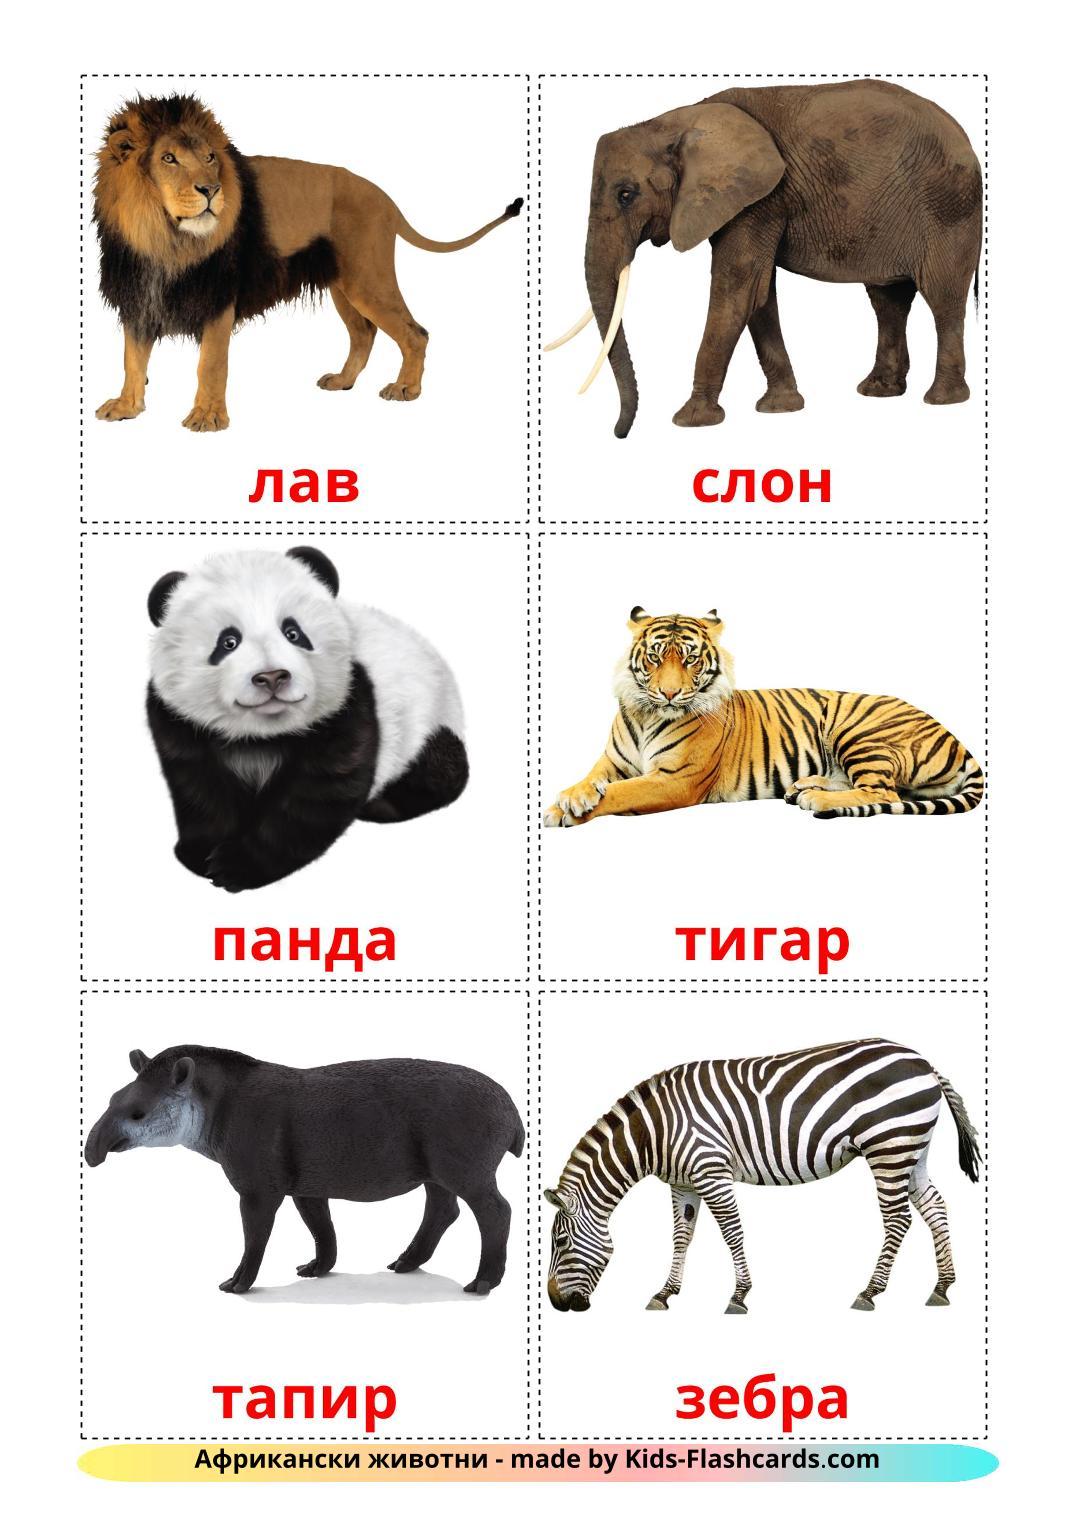 Jungle animals - 21 Free Printable macedonian Flashcards